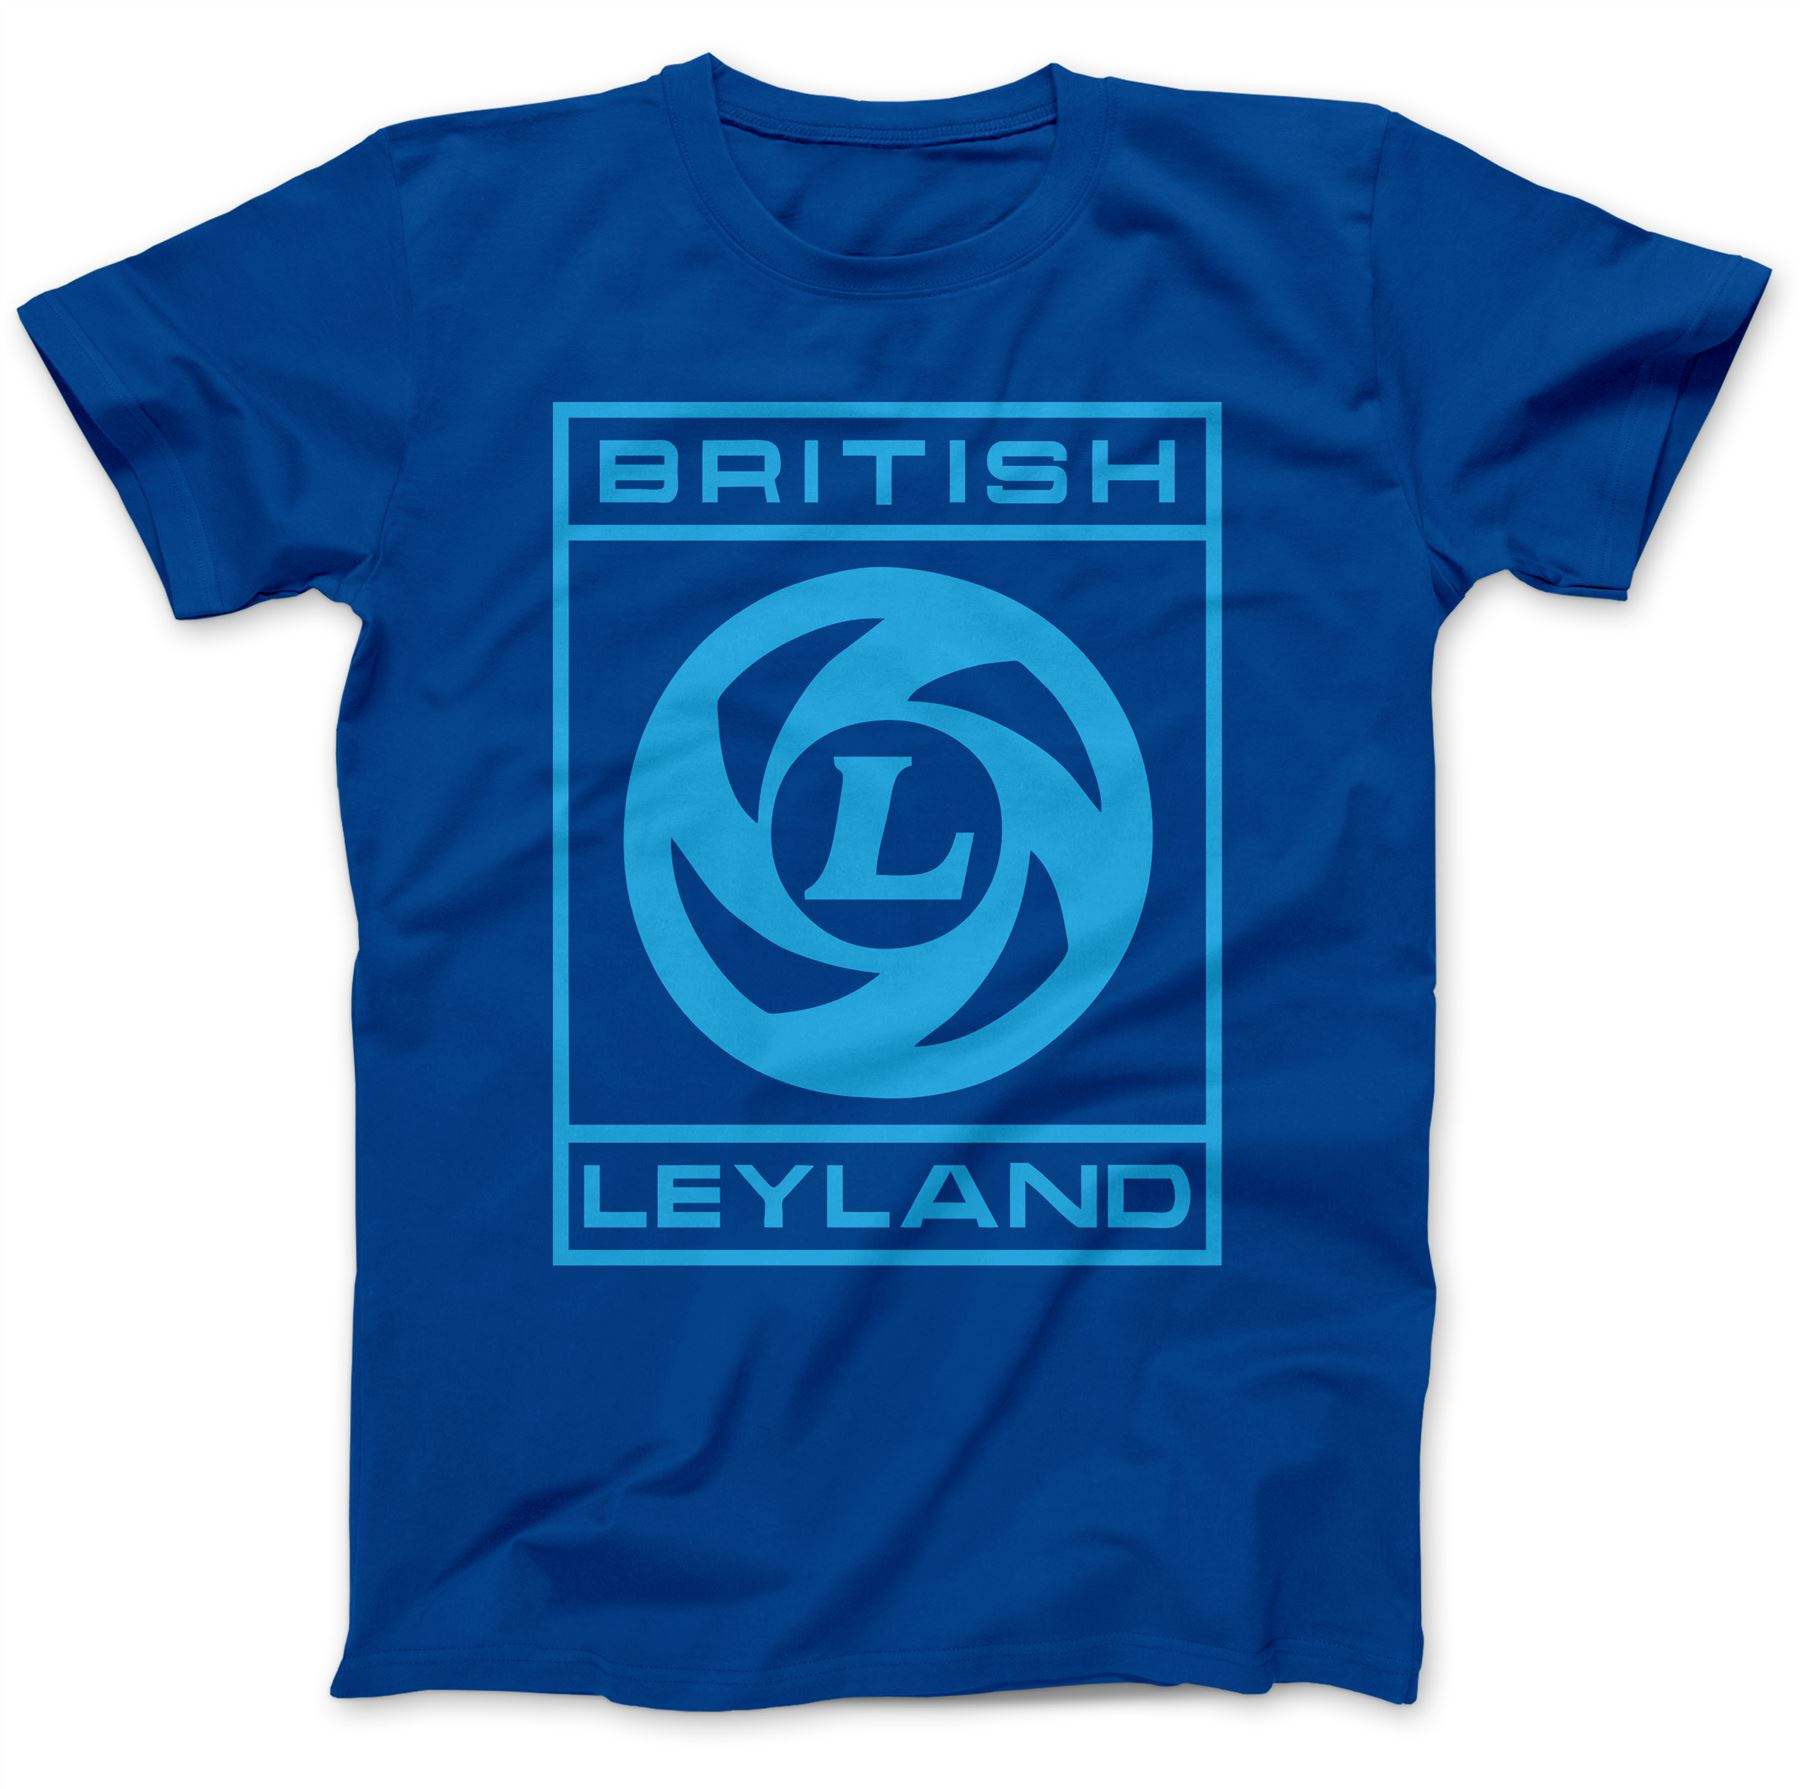 British leyland retro t shirt 100 premium cotton austin for Good looking records t shirt